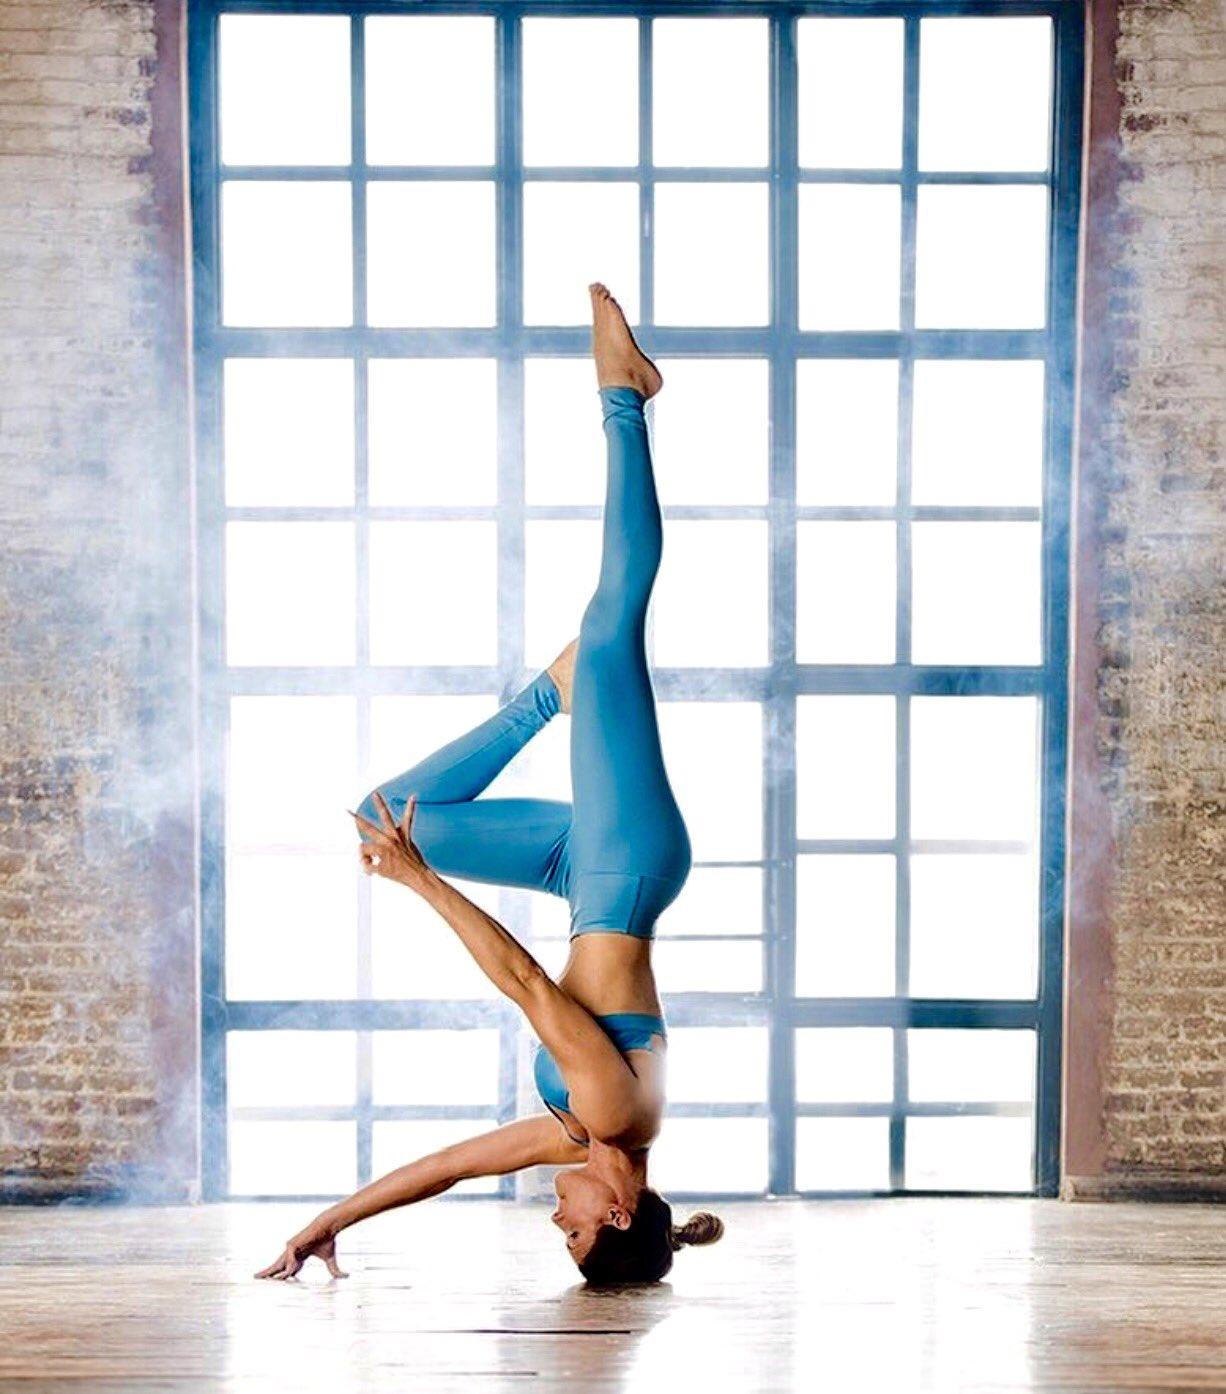 You are powerful beyond measure. 📷 riva_g_  #yoga #yogapose #fitness #fitnessmotivation #wellness #iloveyoga #inspiration https://t.co/ph1BPgIIBF